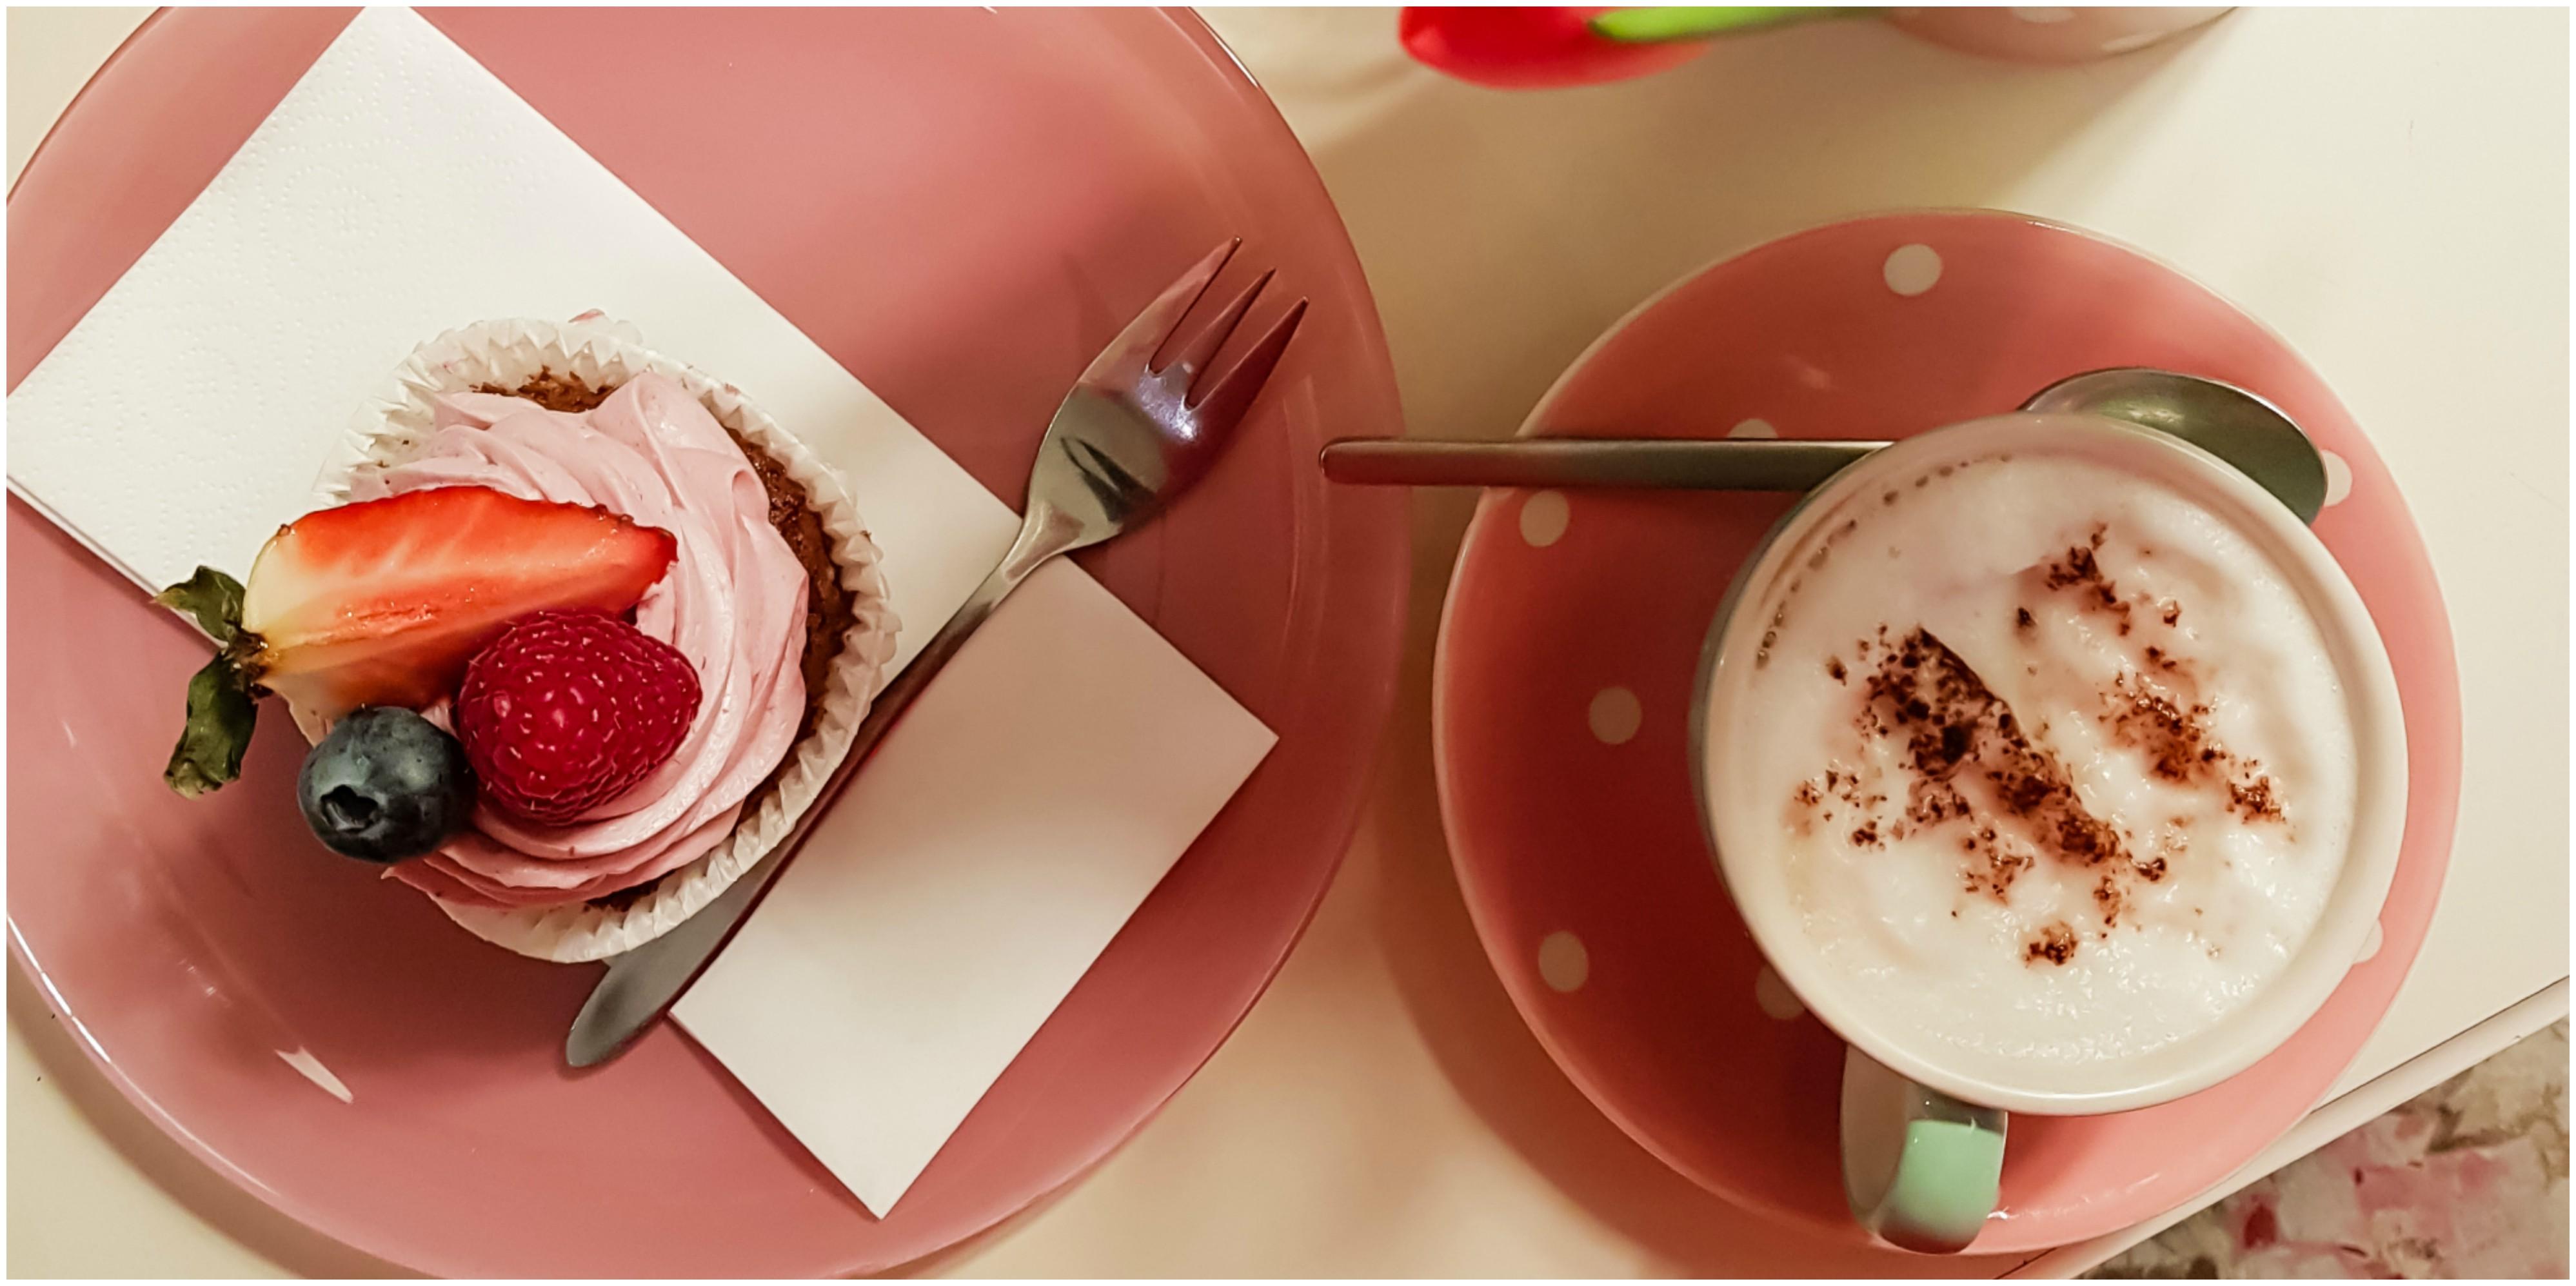 cupcakes-wien-cappuccino-vegan